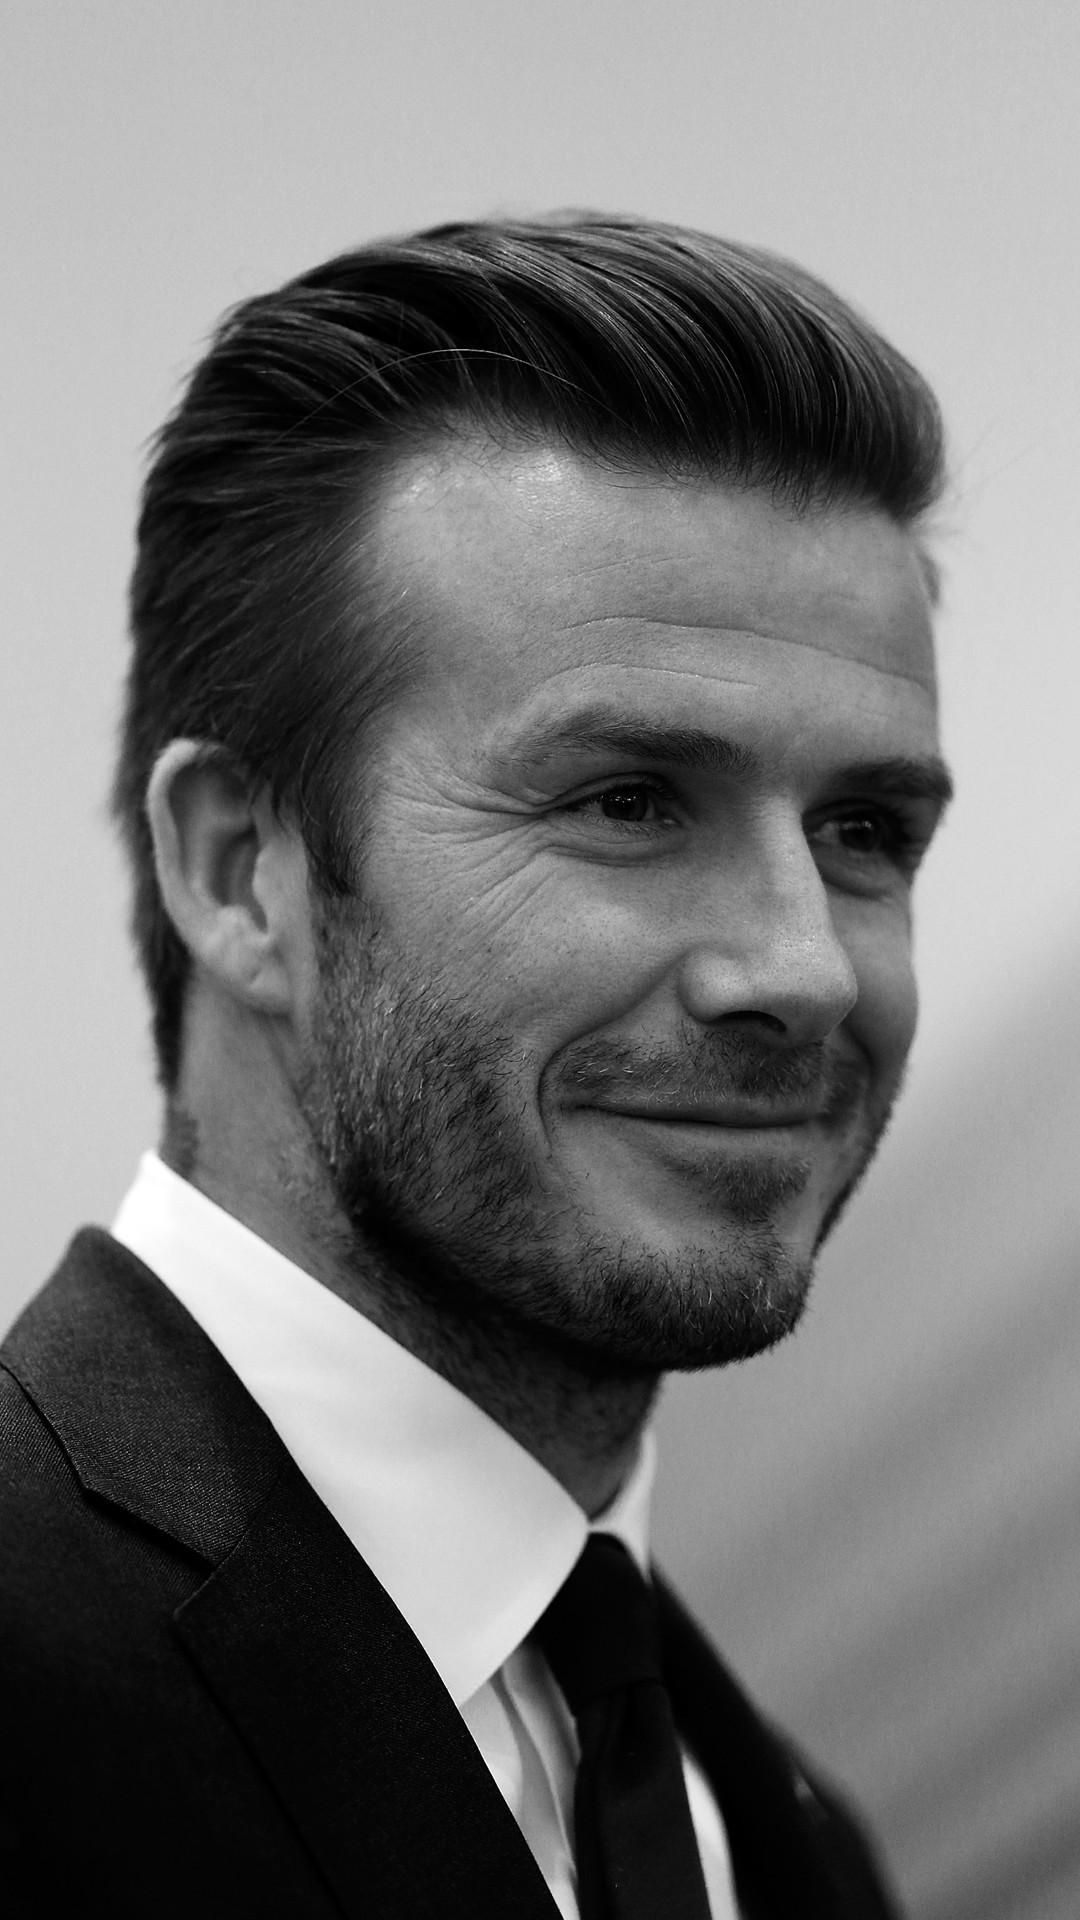 David Beckham Wallpapers (53+ images)